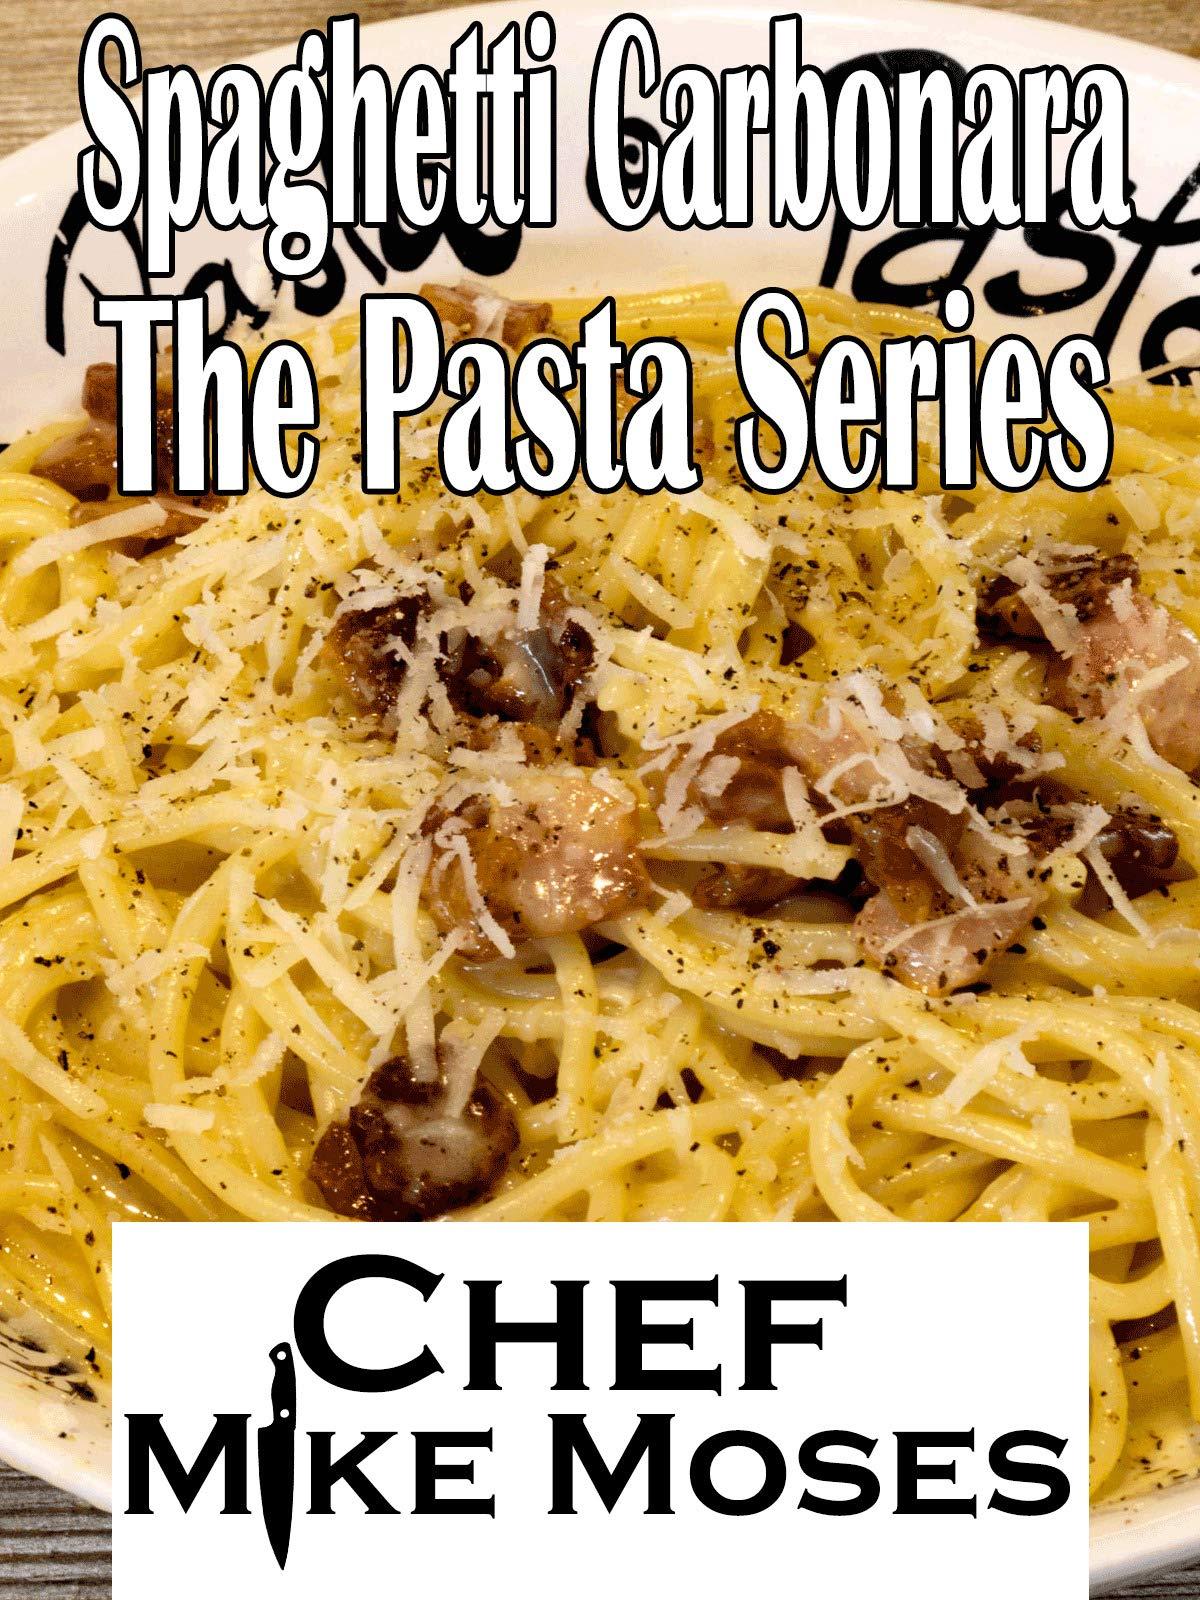 Spaghetti Carbonara The Pasta Series on Amazon Prime Instant Video UK